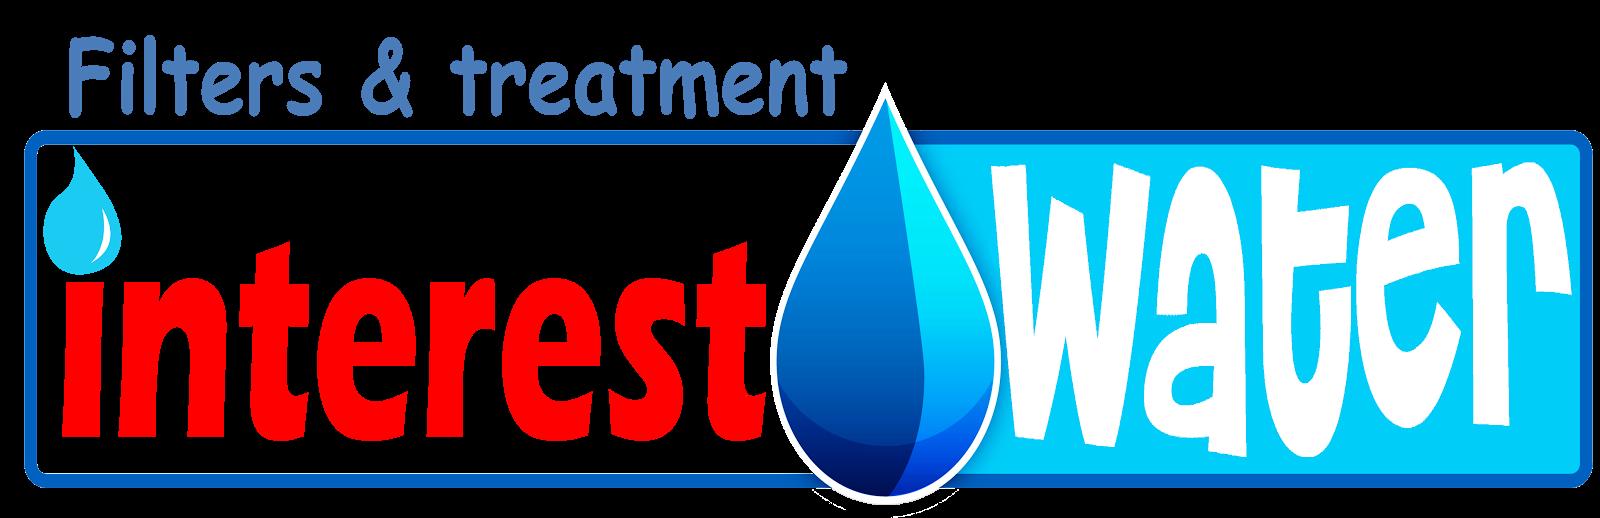 افضل فلتر مياه فى مصر|اسعارفلاترالمياه